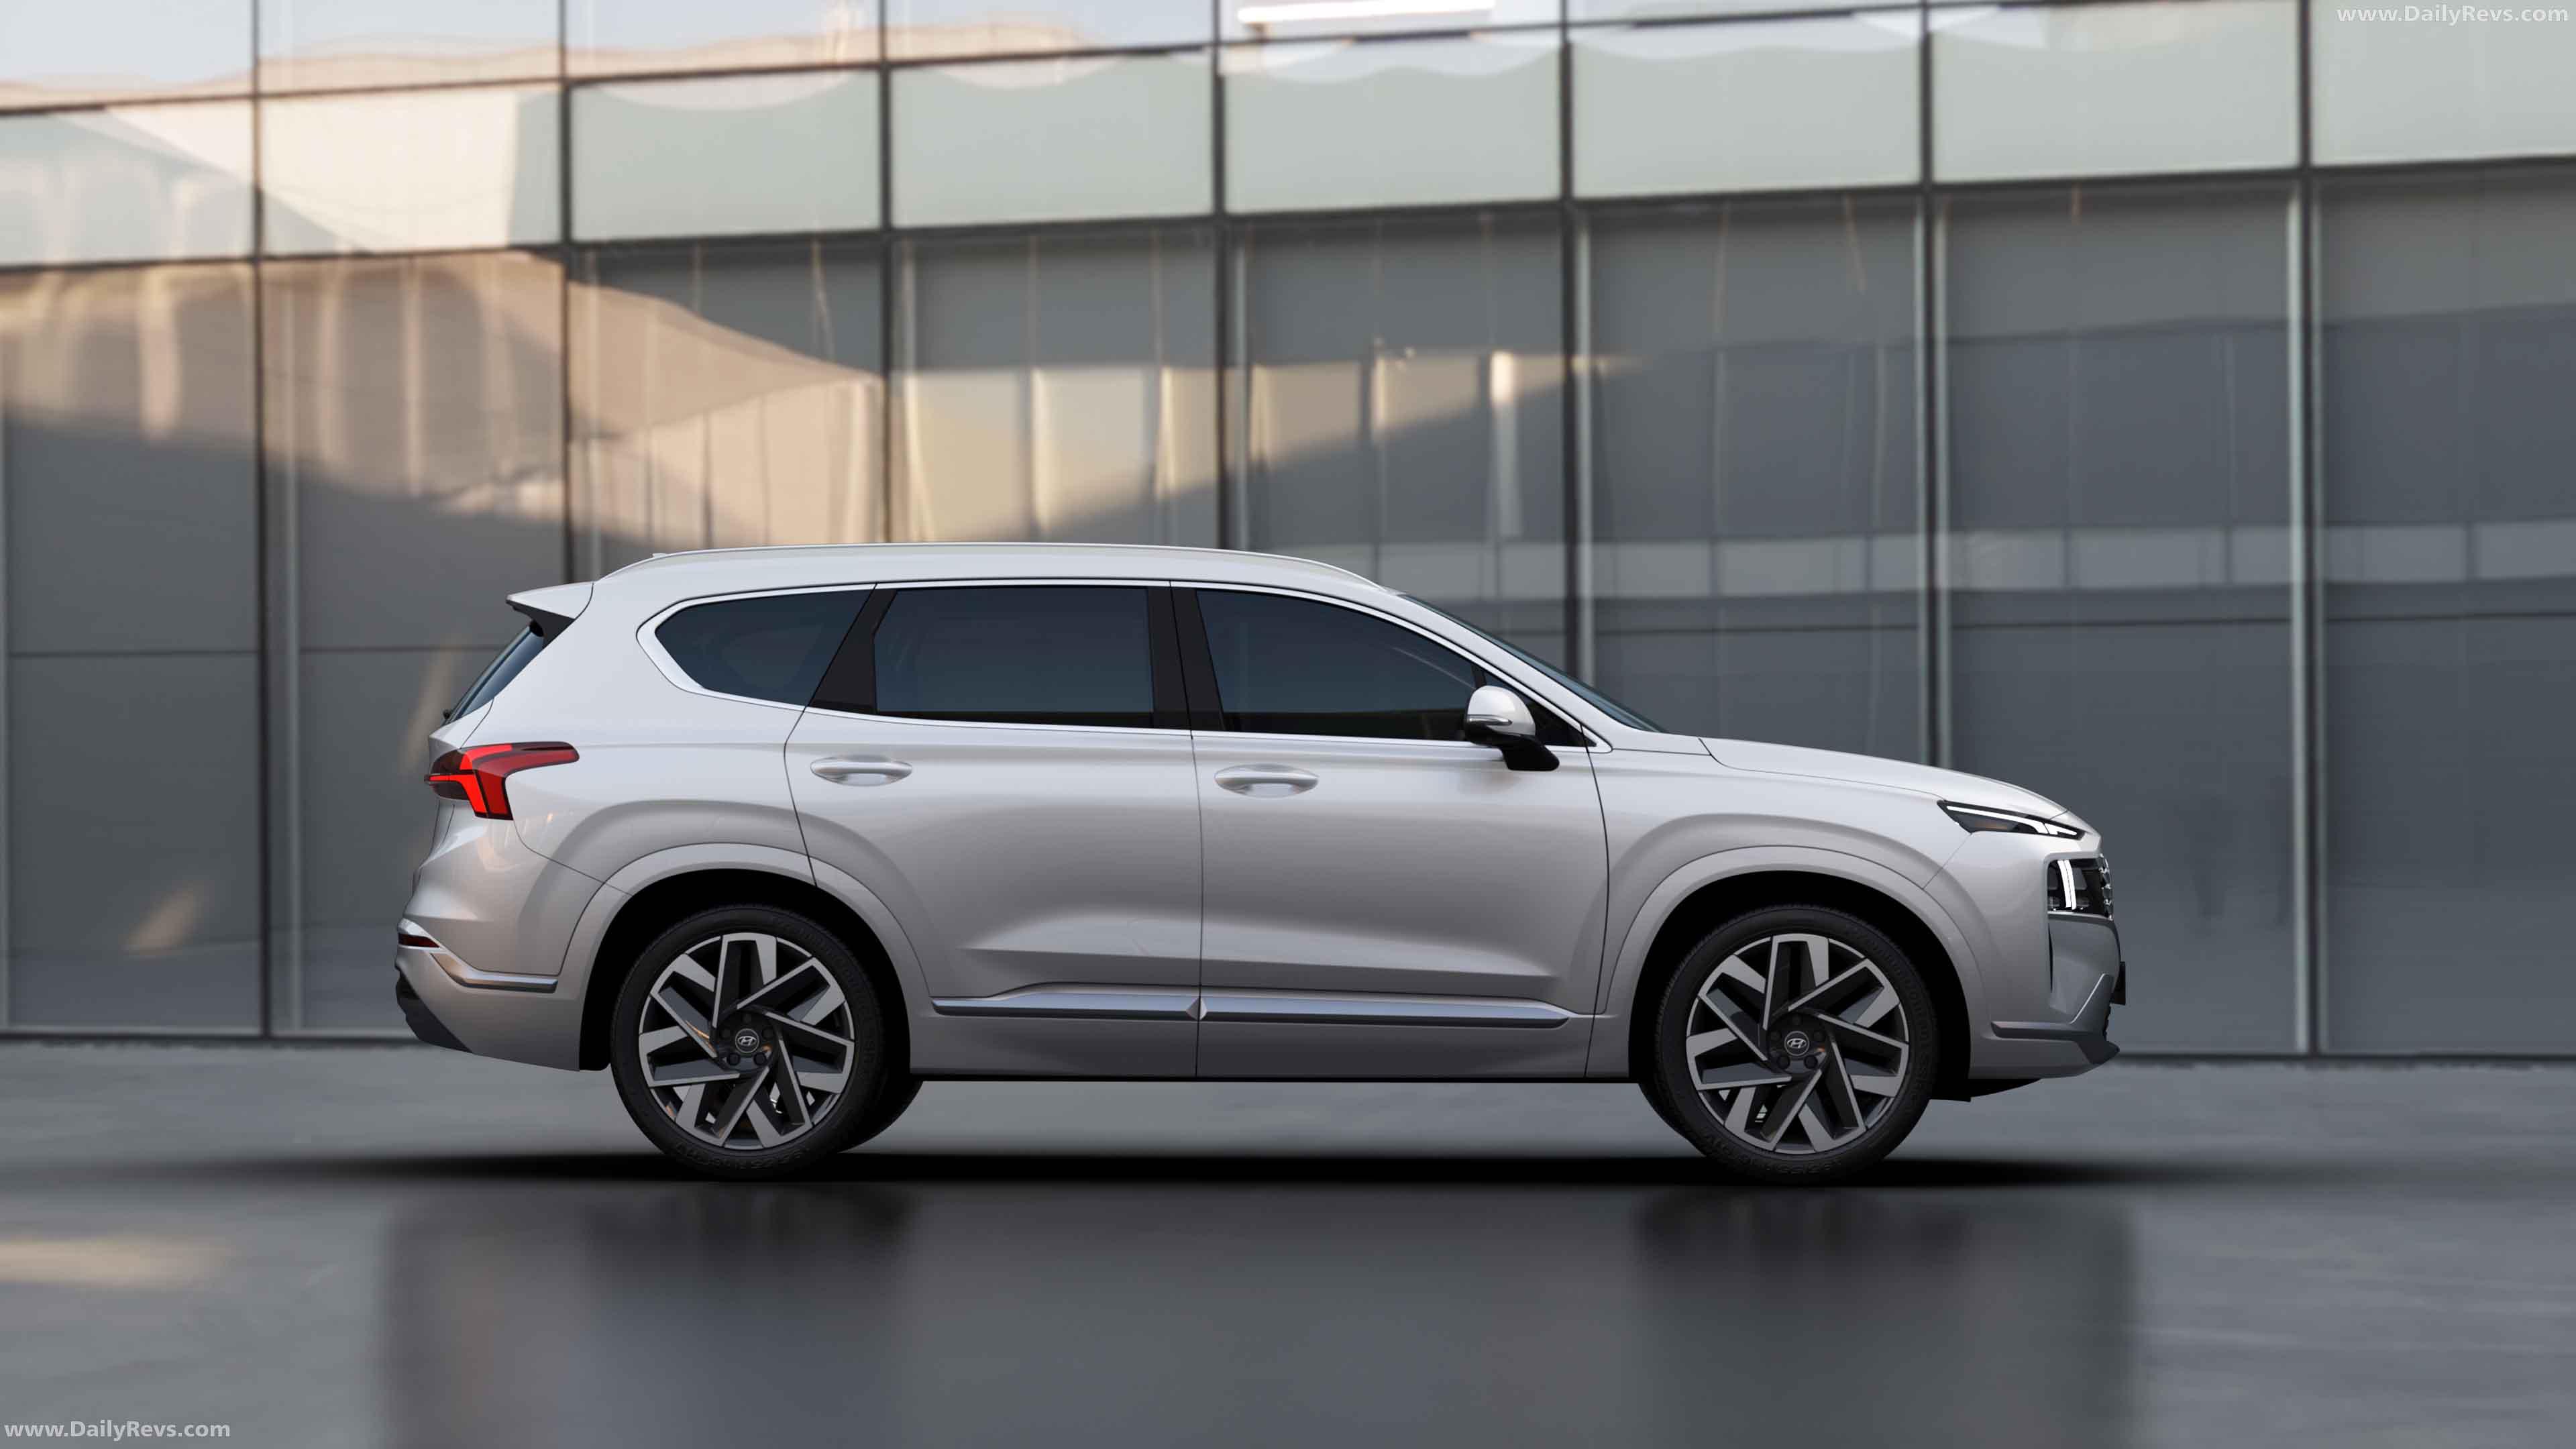 2021 Hyundai Santa Fe - Dailyrevs